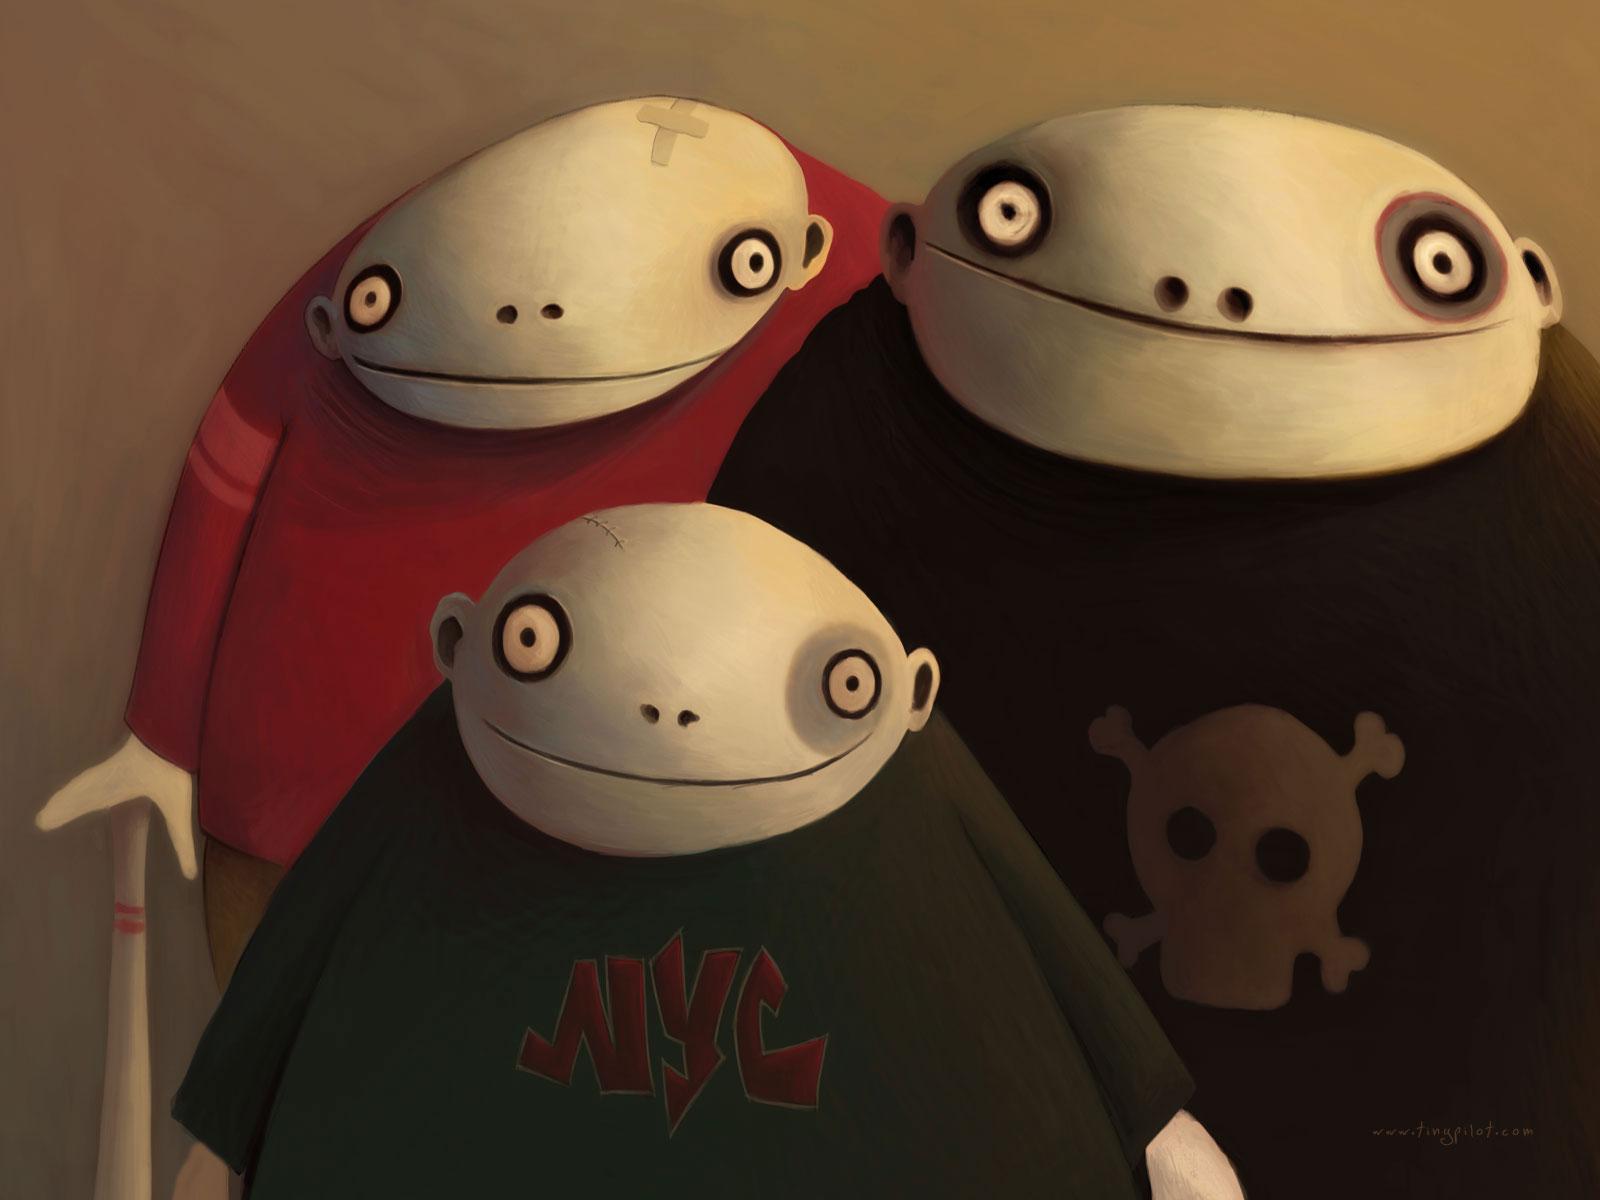 The Gang - Wallpaper